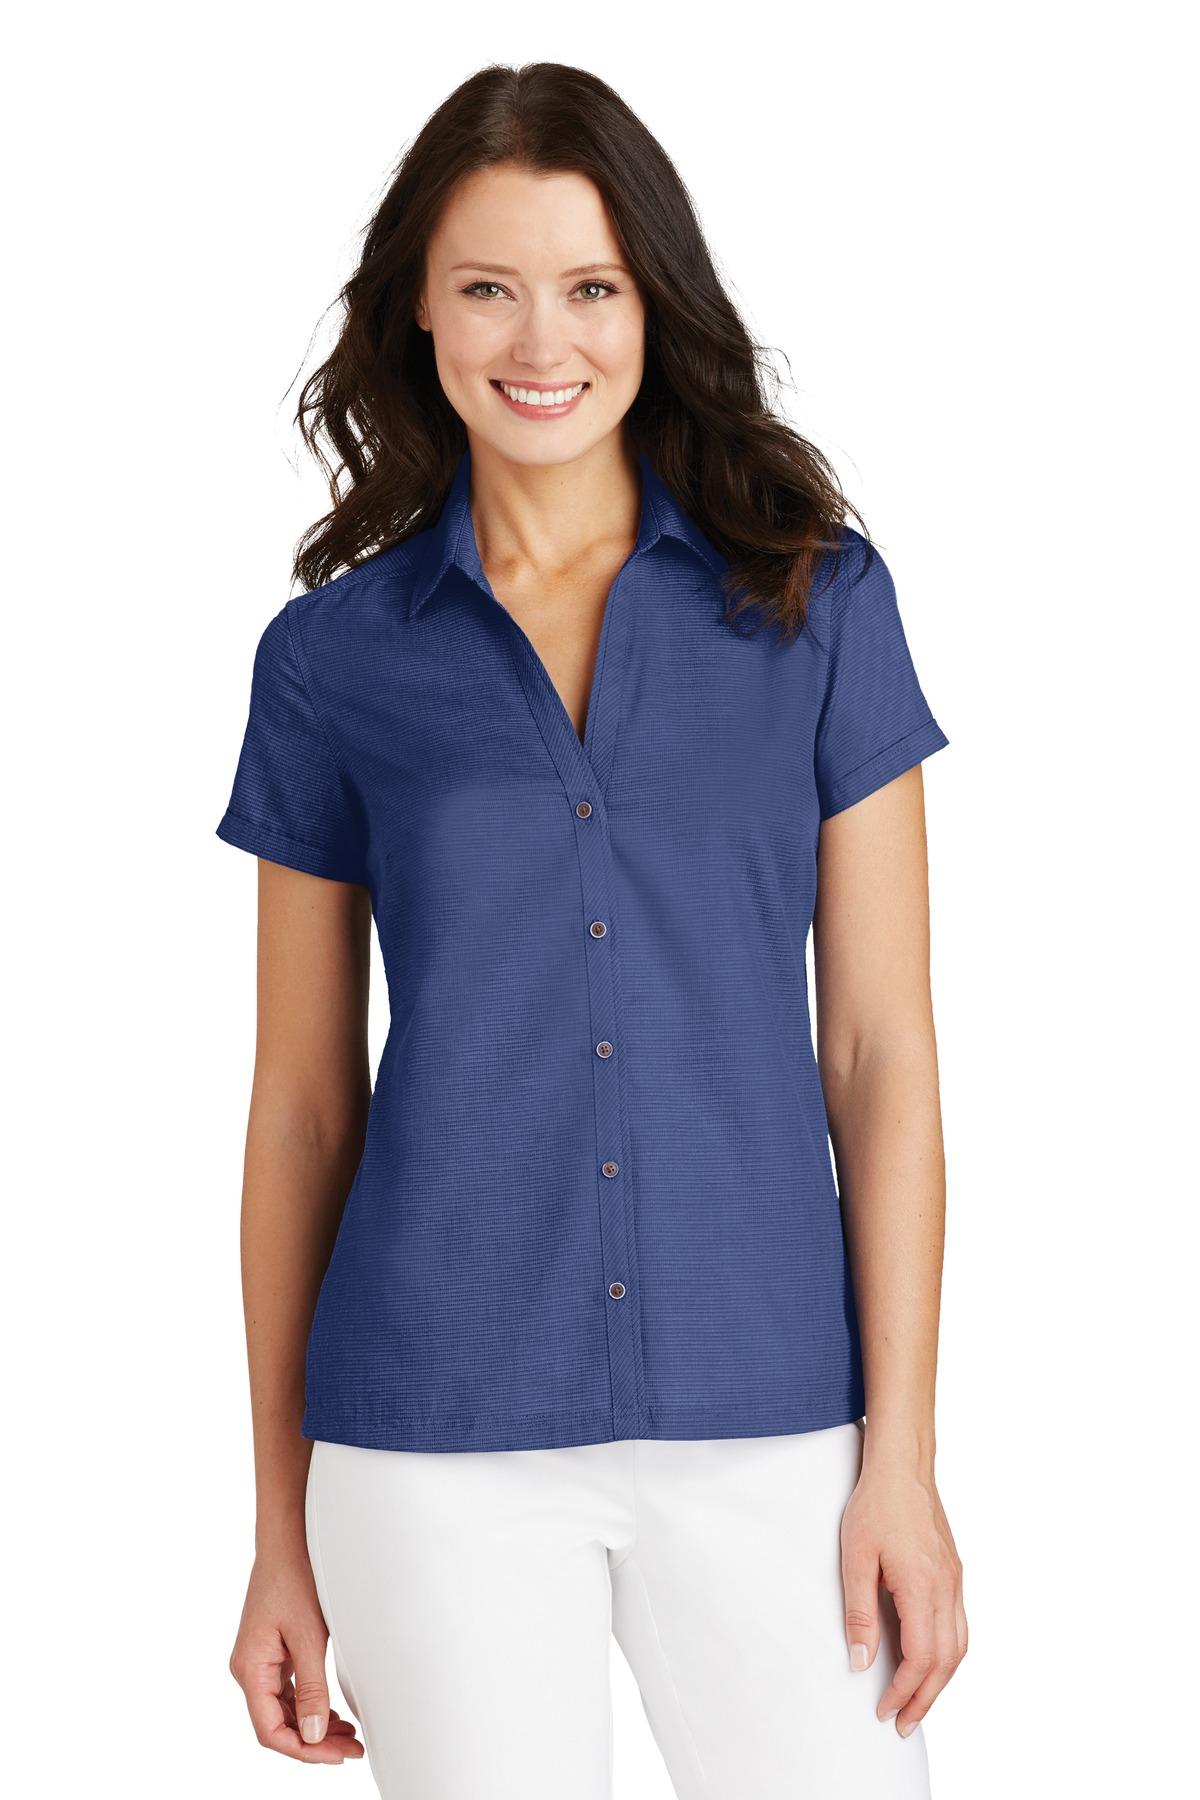 L662 - Port Authority® Ladies Textured Camp Shirt.-